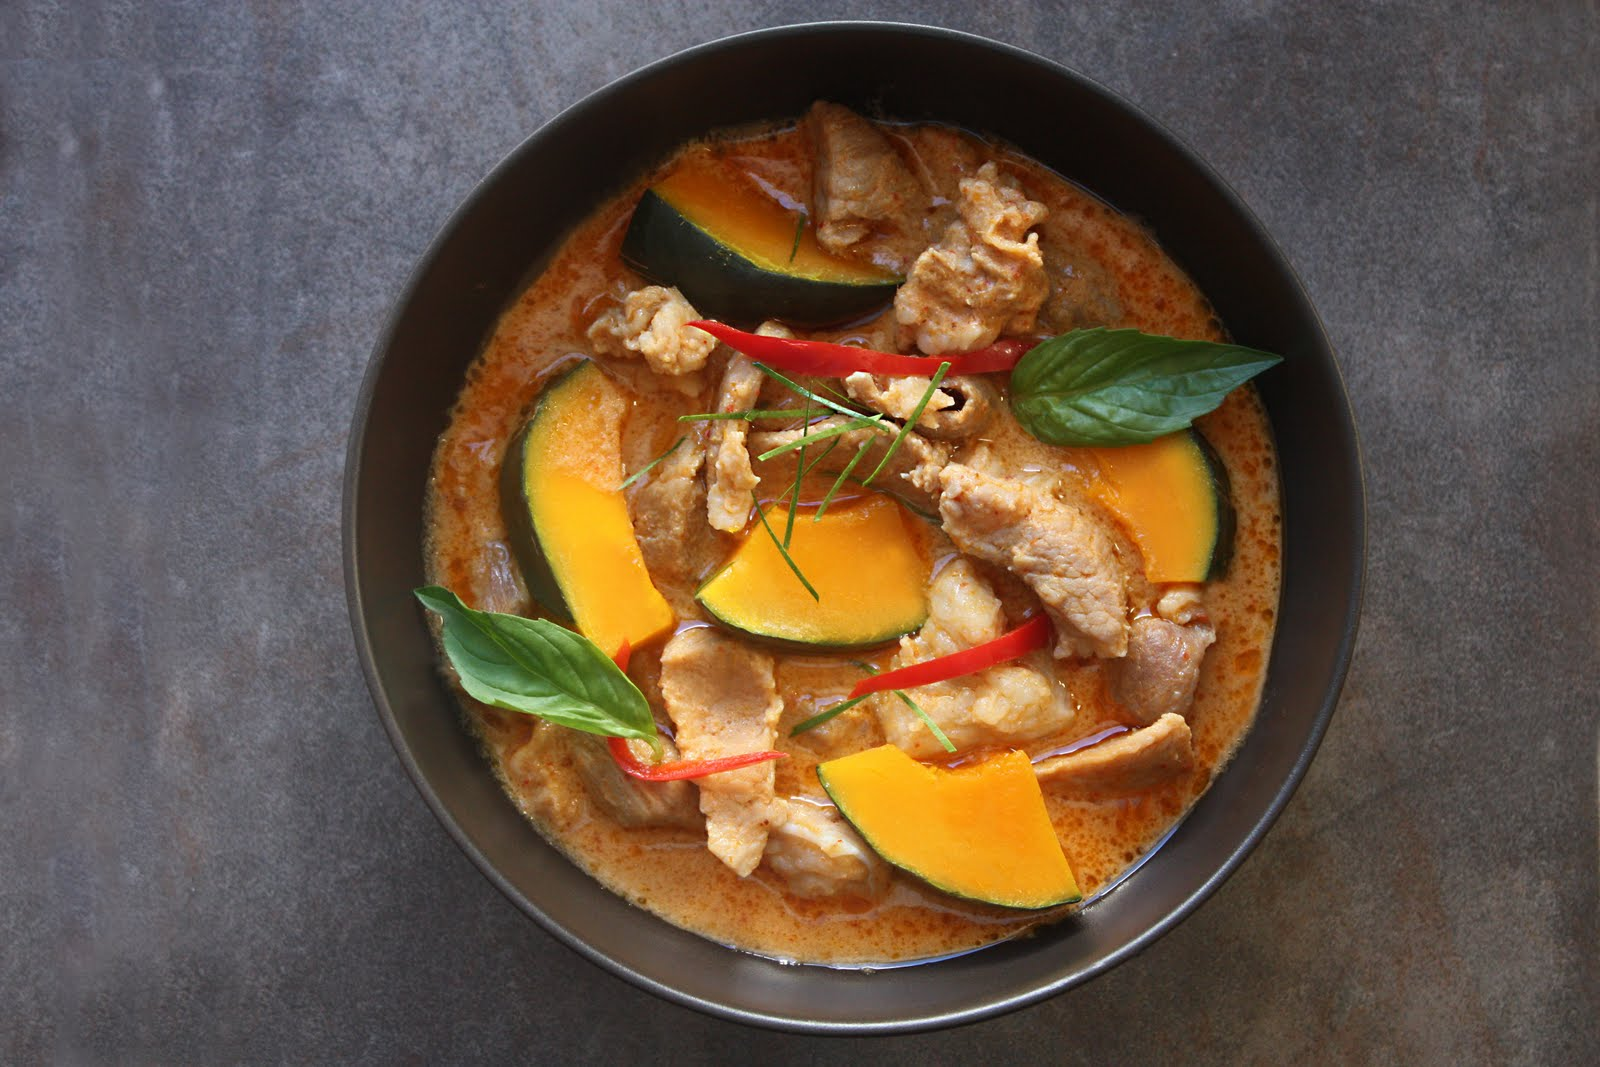 Kabocha squash pork recipe